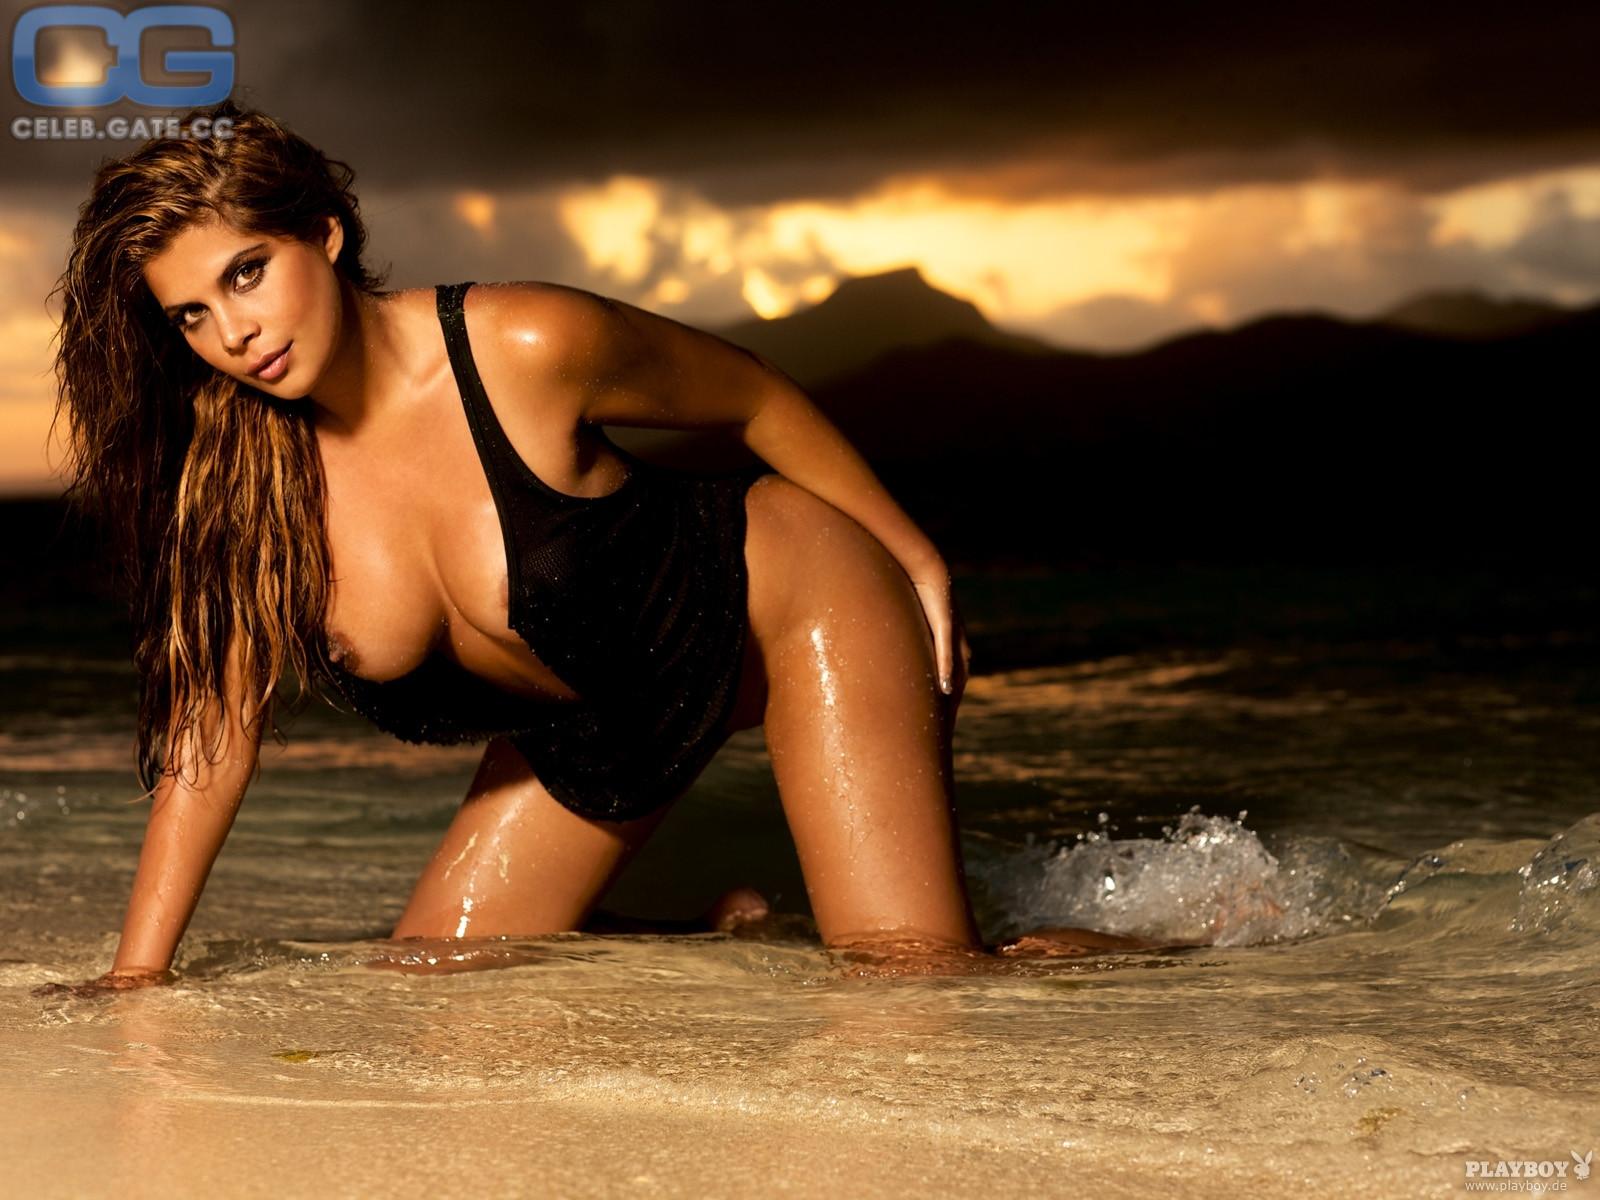 Indira Weis Playboy